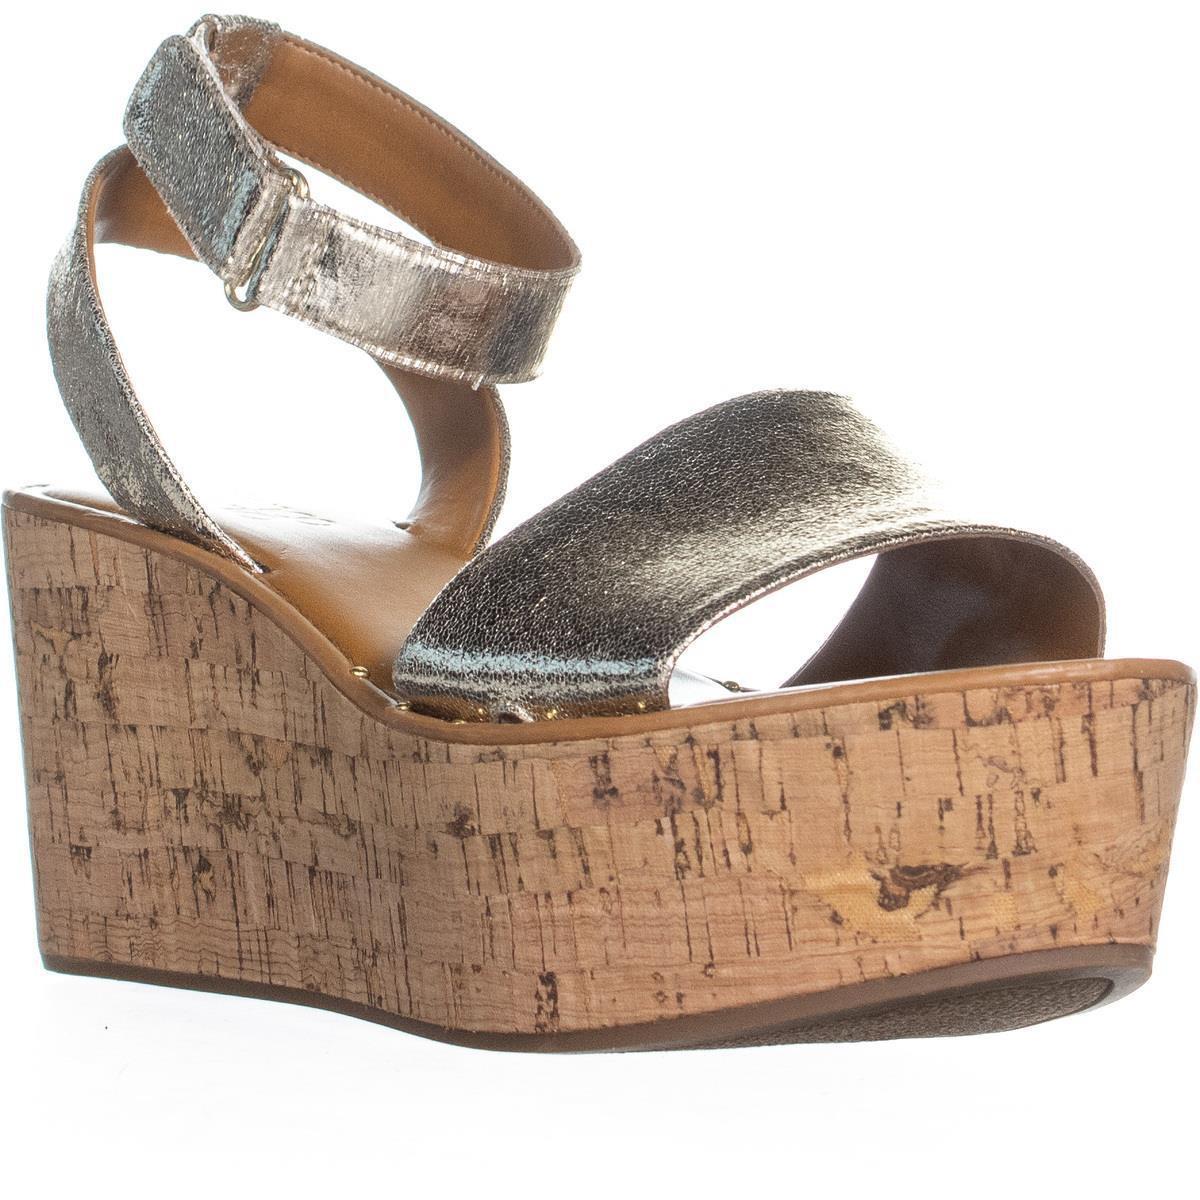 6f81df8e468 Franco Sarto Jovie Platform Wedge Sandals in Metallic - Lyst